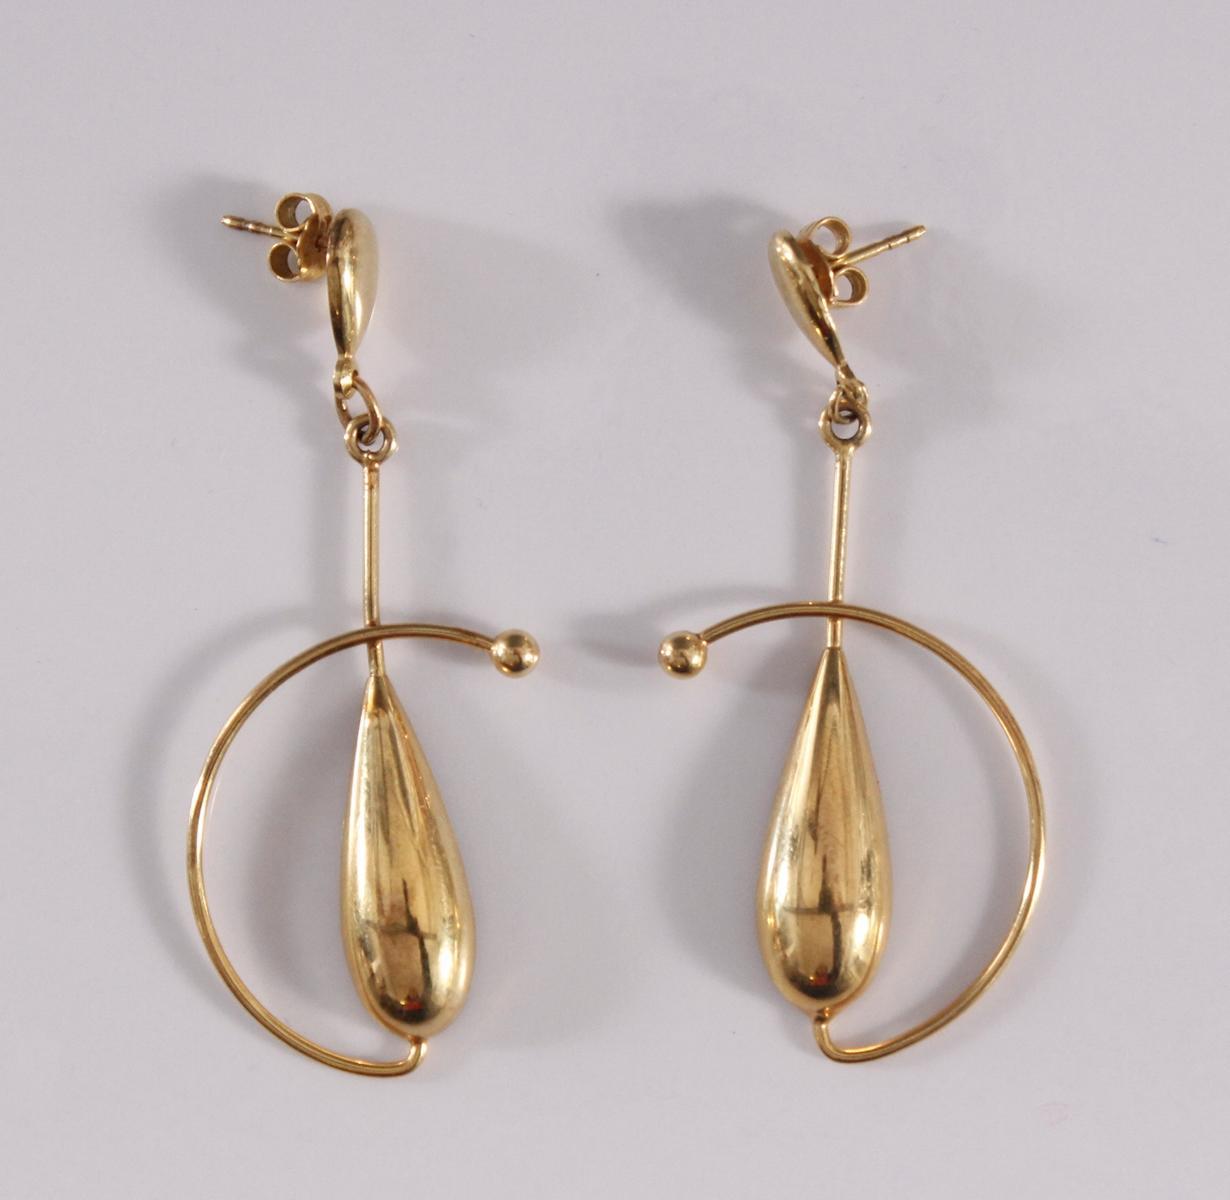 Paar Ohrgehänge, 8 Karat Gelbgold